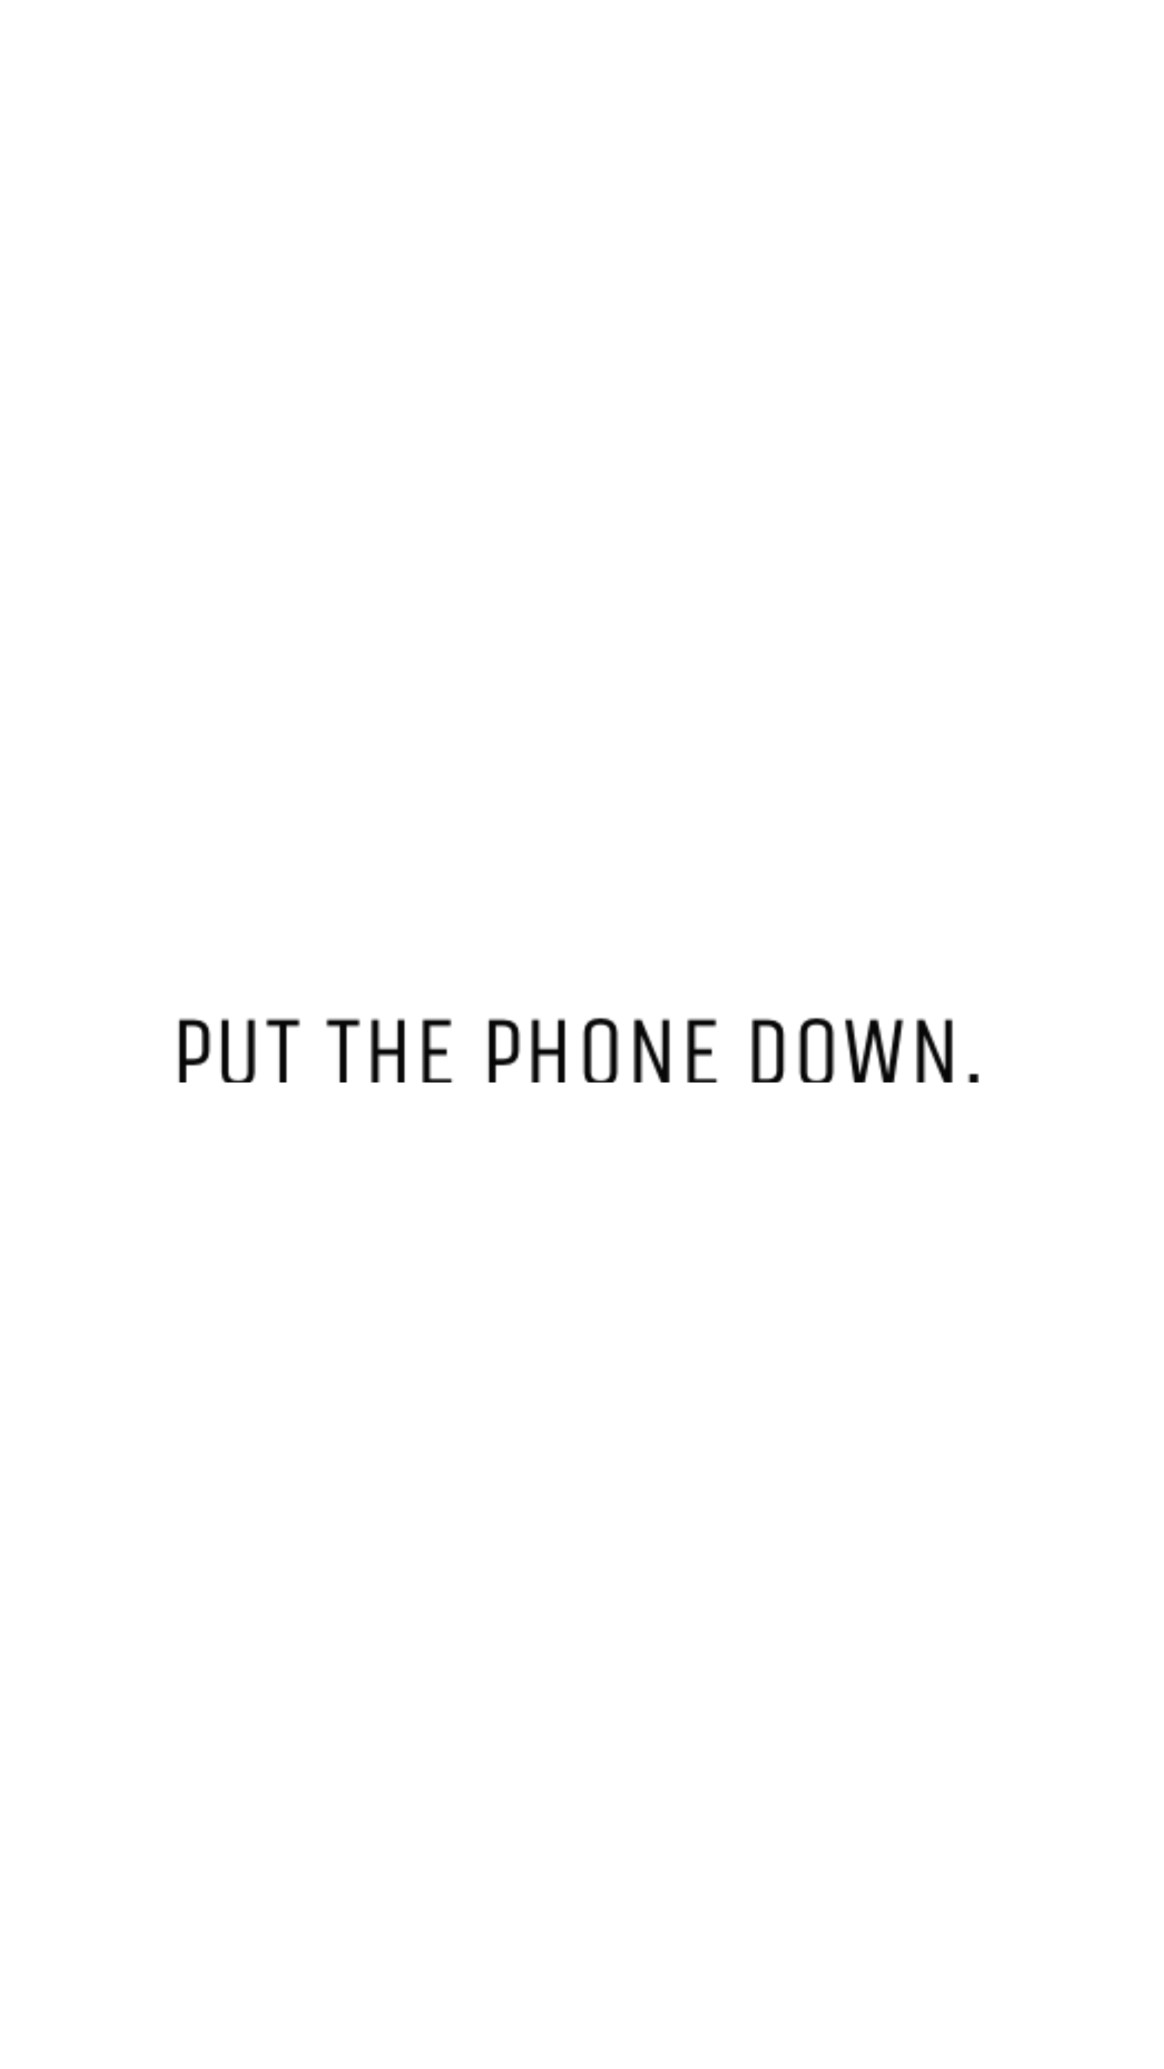 "Free Minimal Phone Wallpaper: ""Put the Phone Down!"" Lock Screen …"